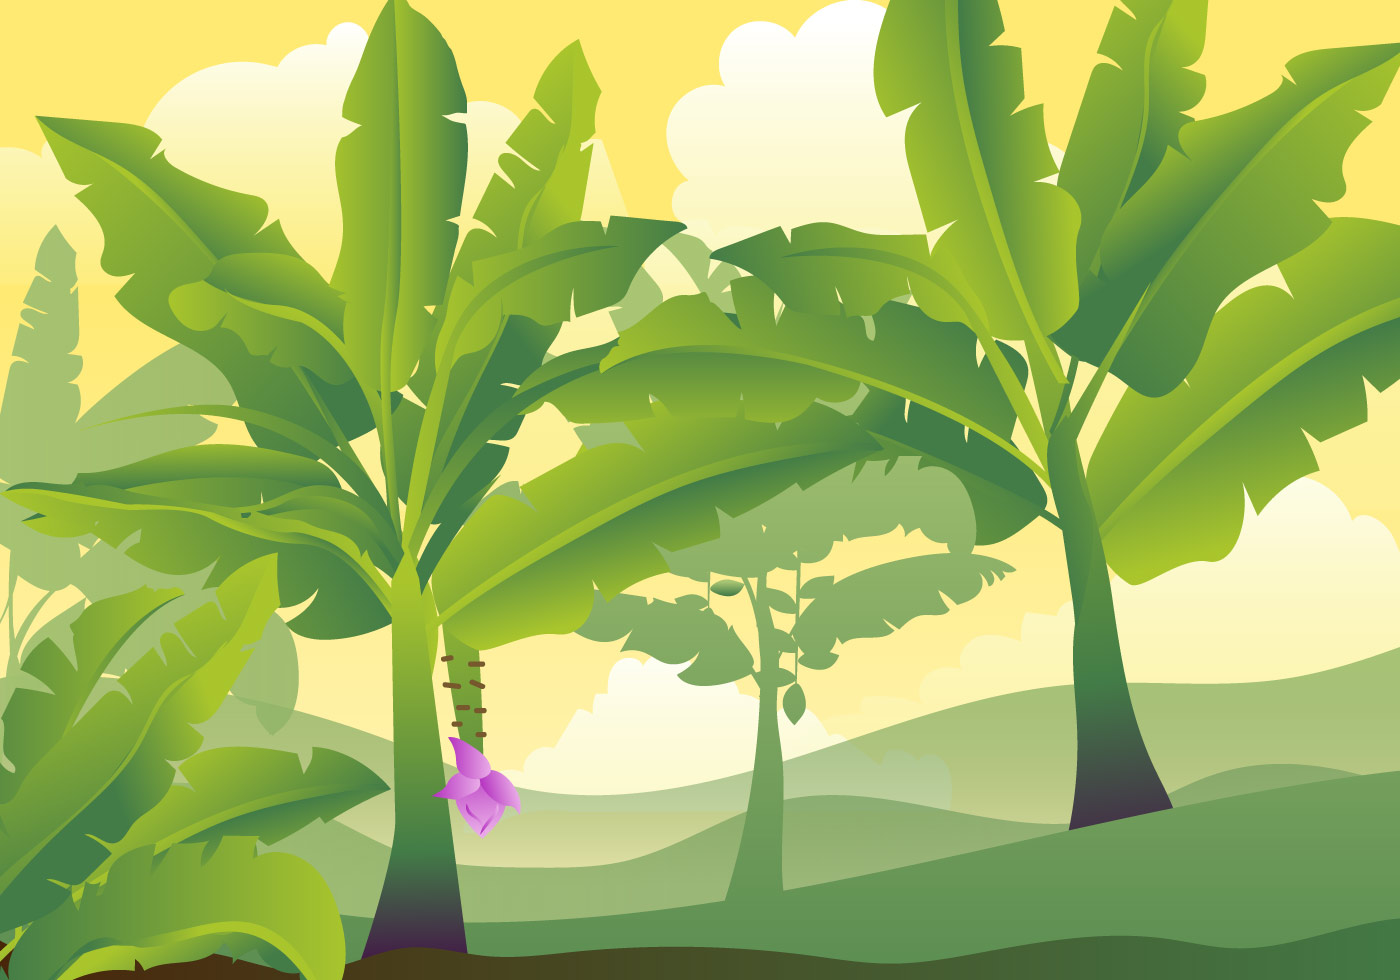 Banana Tree Leaves illustration - Download Free Vector Art ...